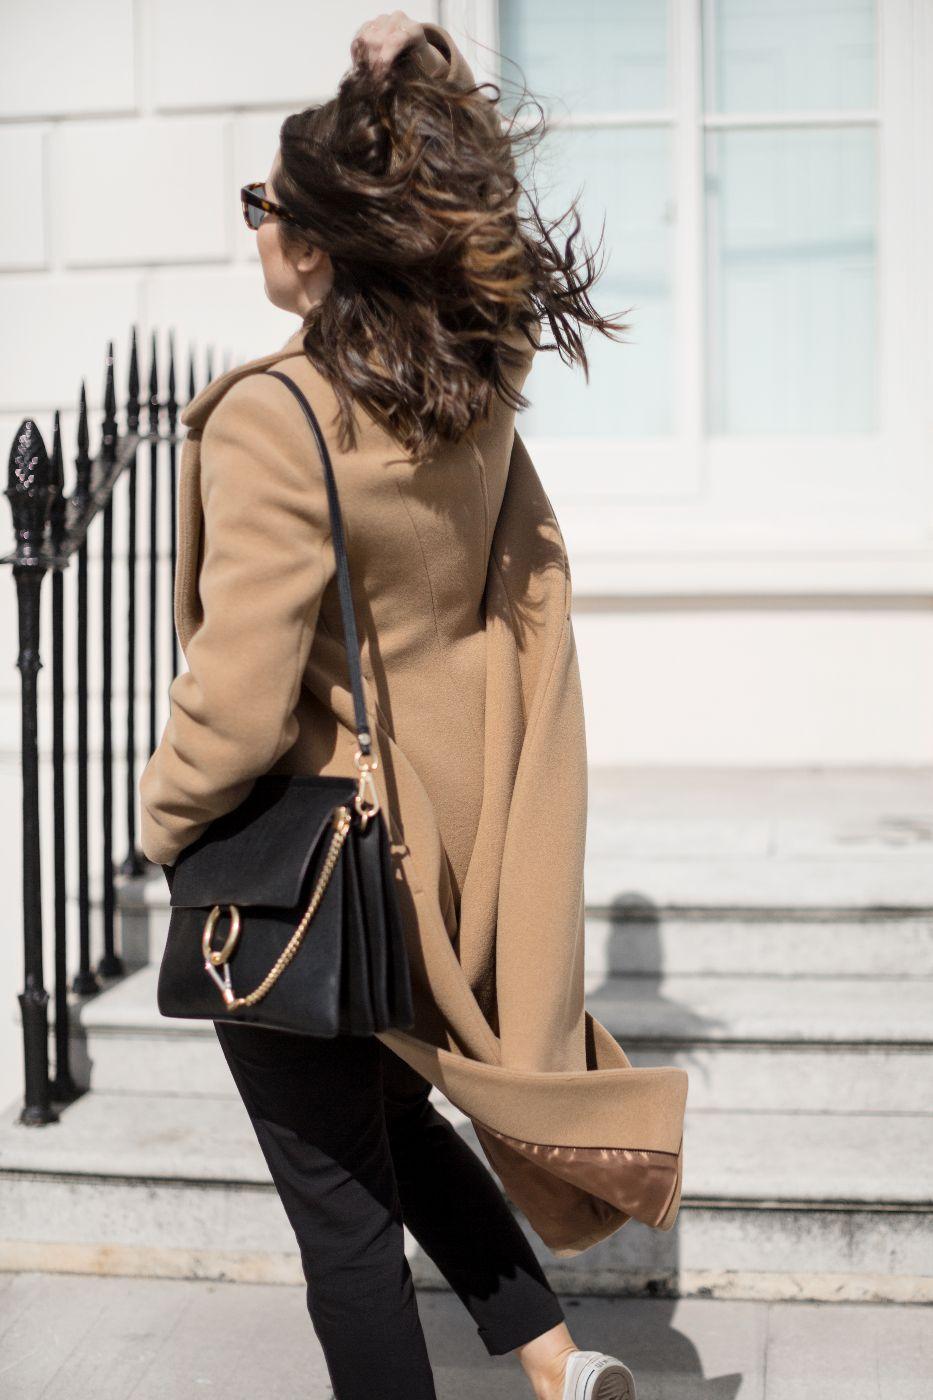 theannaedit-new-autumn-winter-coat-whistles-fashion-september-2017-9